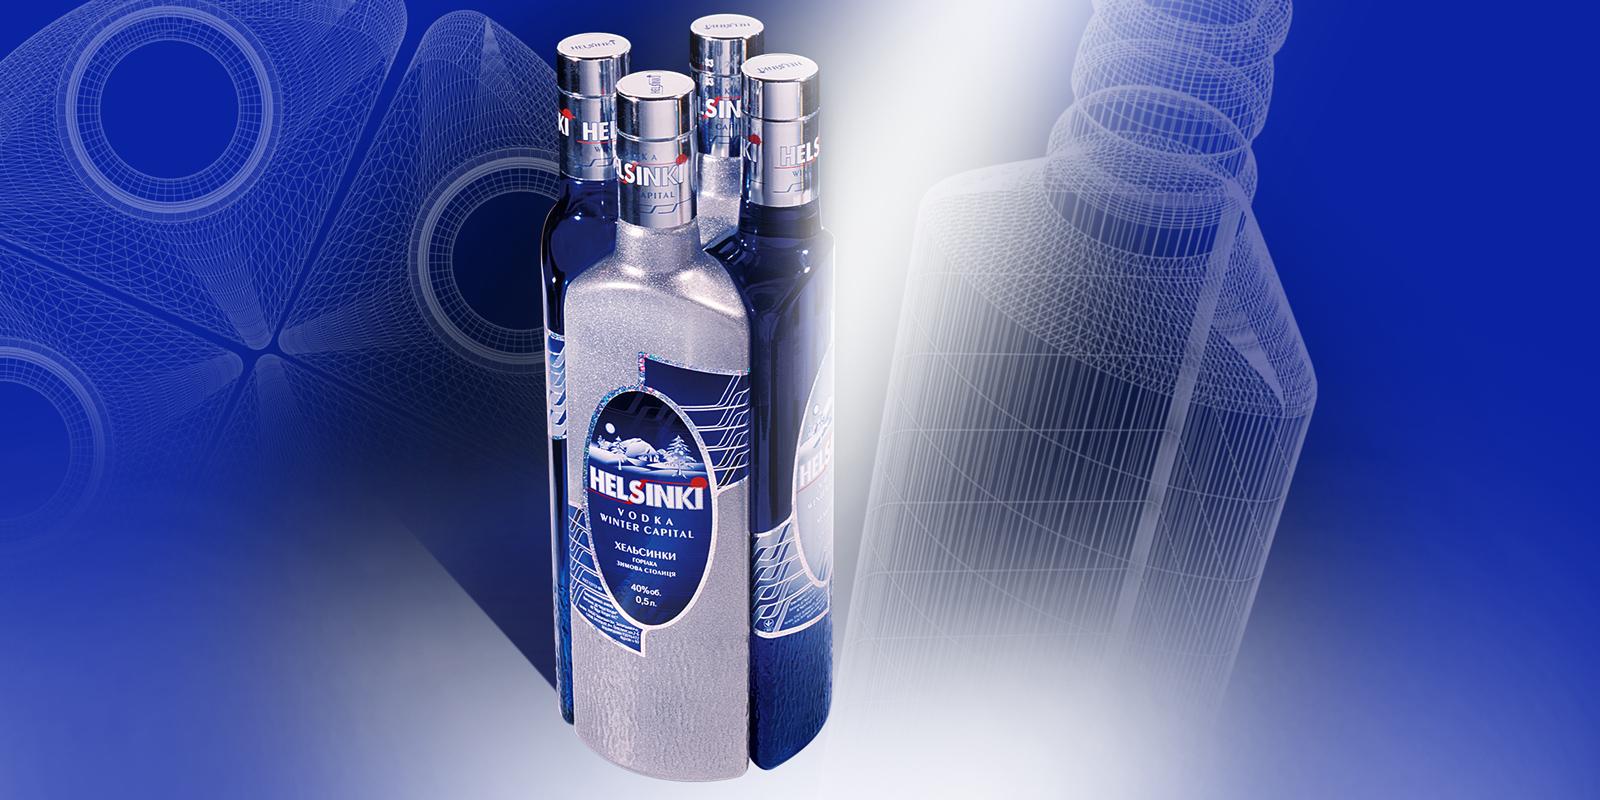 TM «Helsinki»;;;;;;Дизайн бутылки;;;;;;<span>Клиент:</span> Компания «Алеф Виналь»;;;;;;;;;;;;Дизайн бутылки;;;;;;7